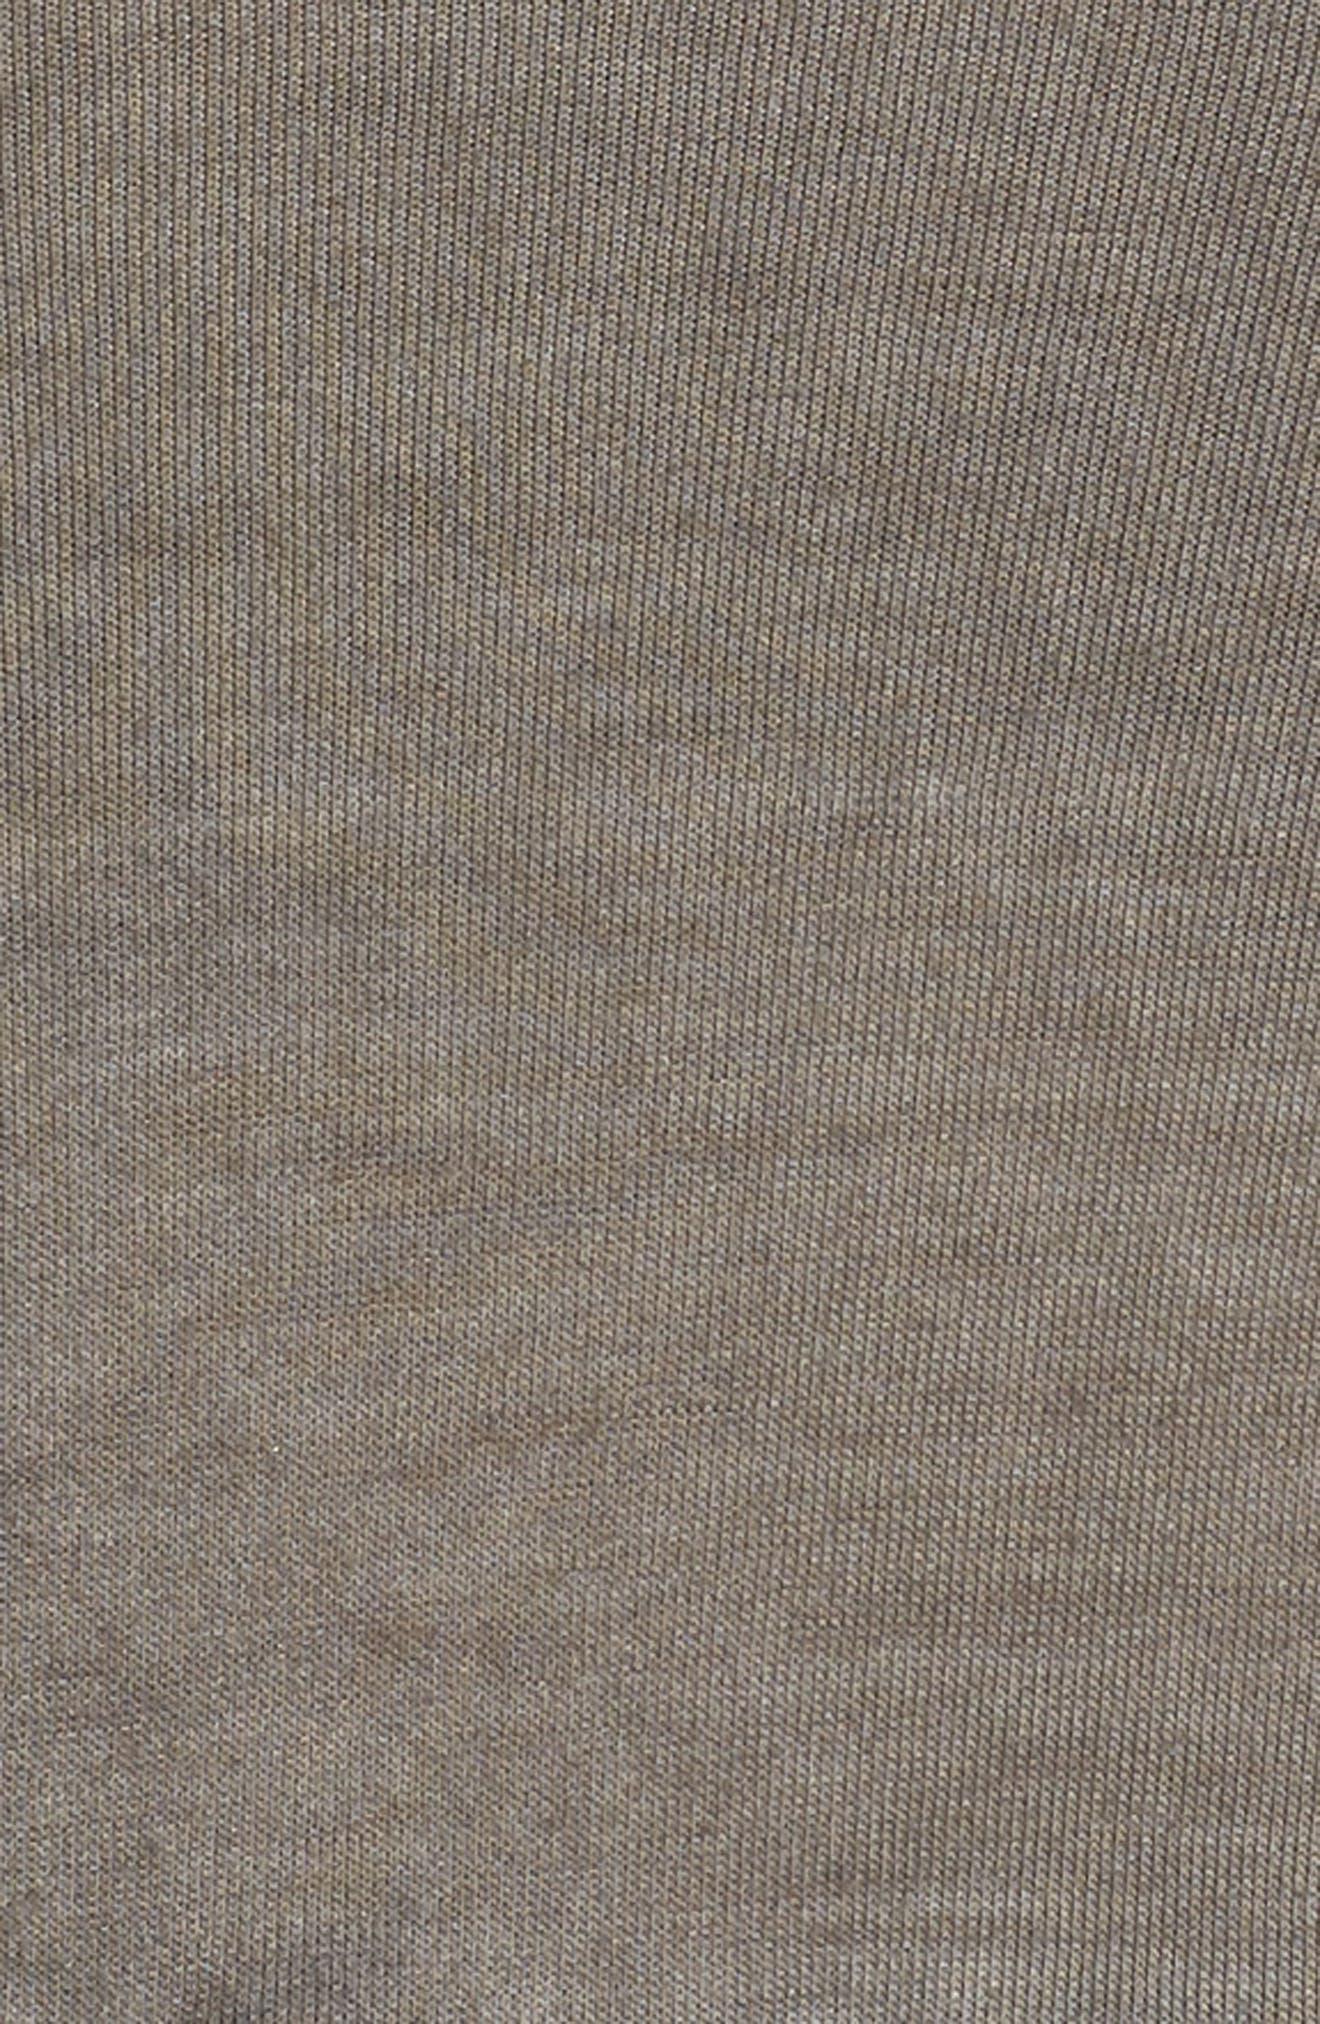 DANTELLE,                             Oil Dye Knit Lace Inset Top,                             Alternate thumbnail 5, color,                             FALCON